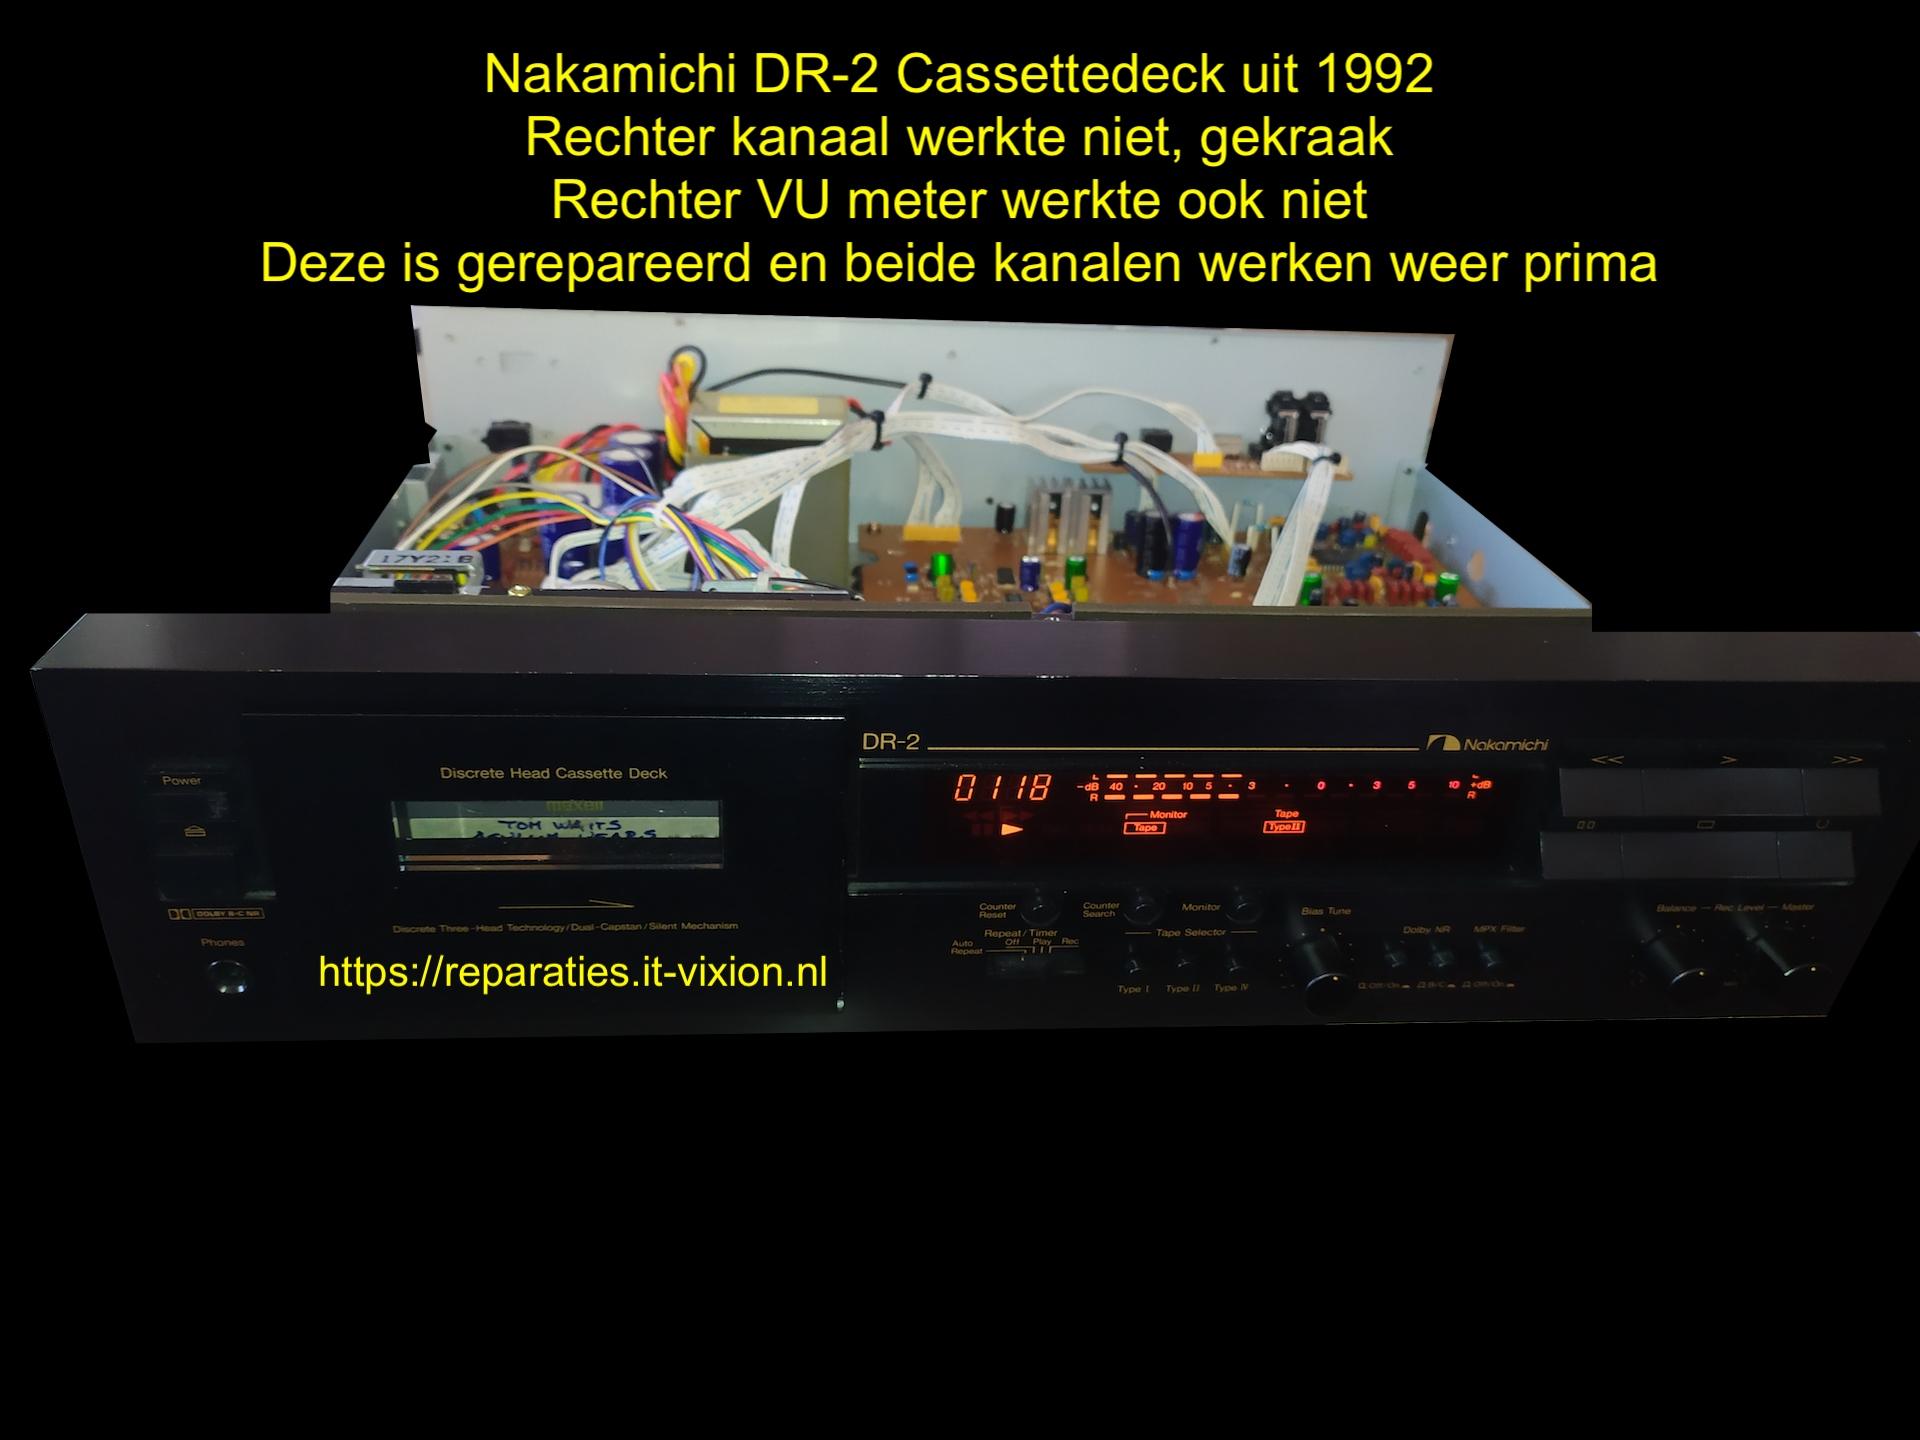 Nakamichi DR-2 Cassettedeck uit 1992